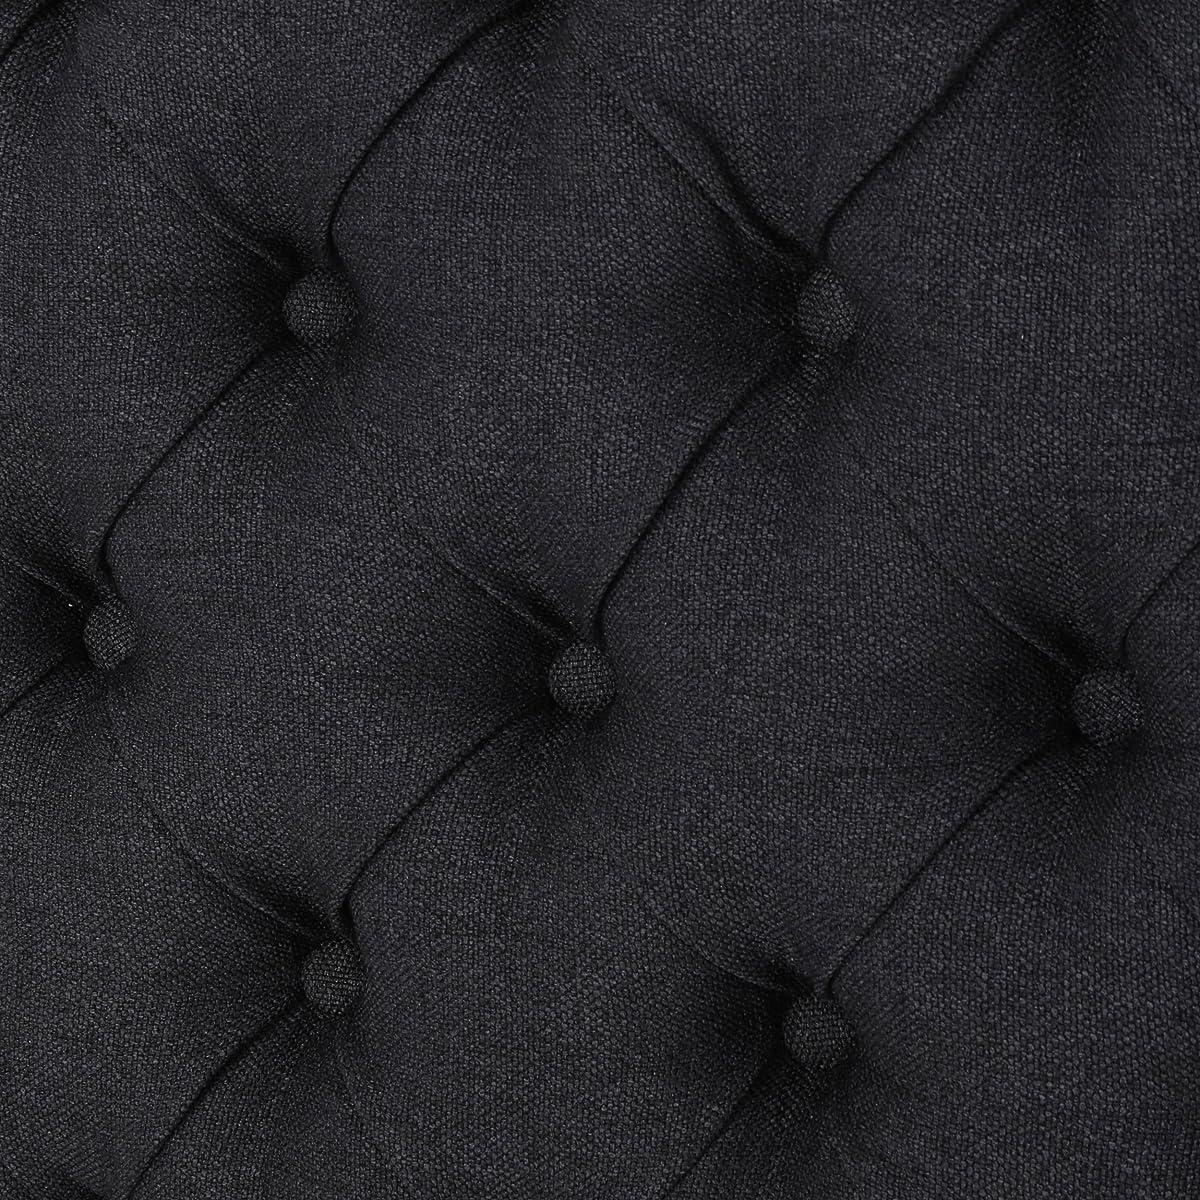 Hunter Dark Charcoal Fabric Queen/Full Headboard